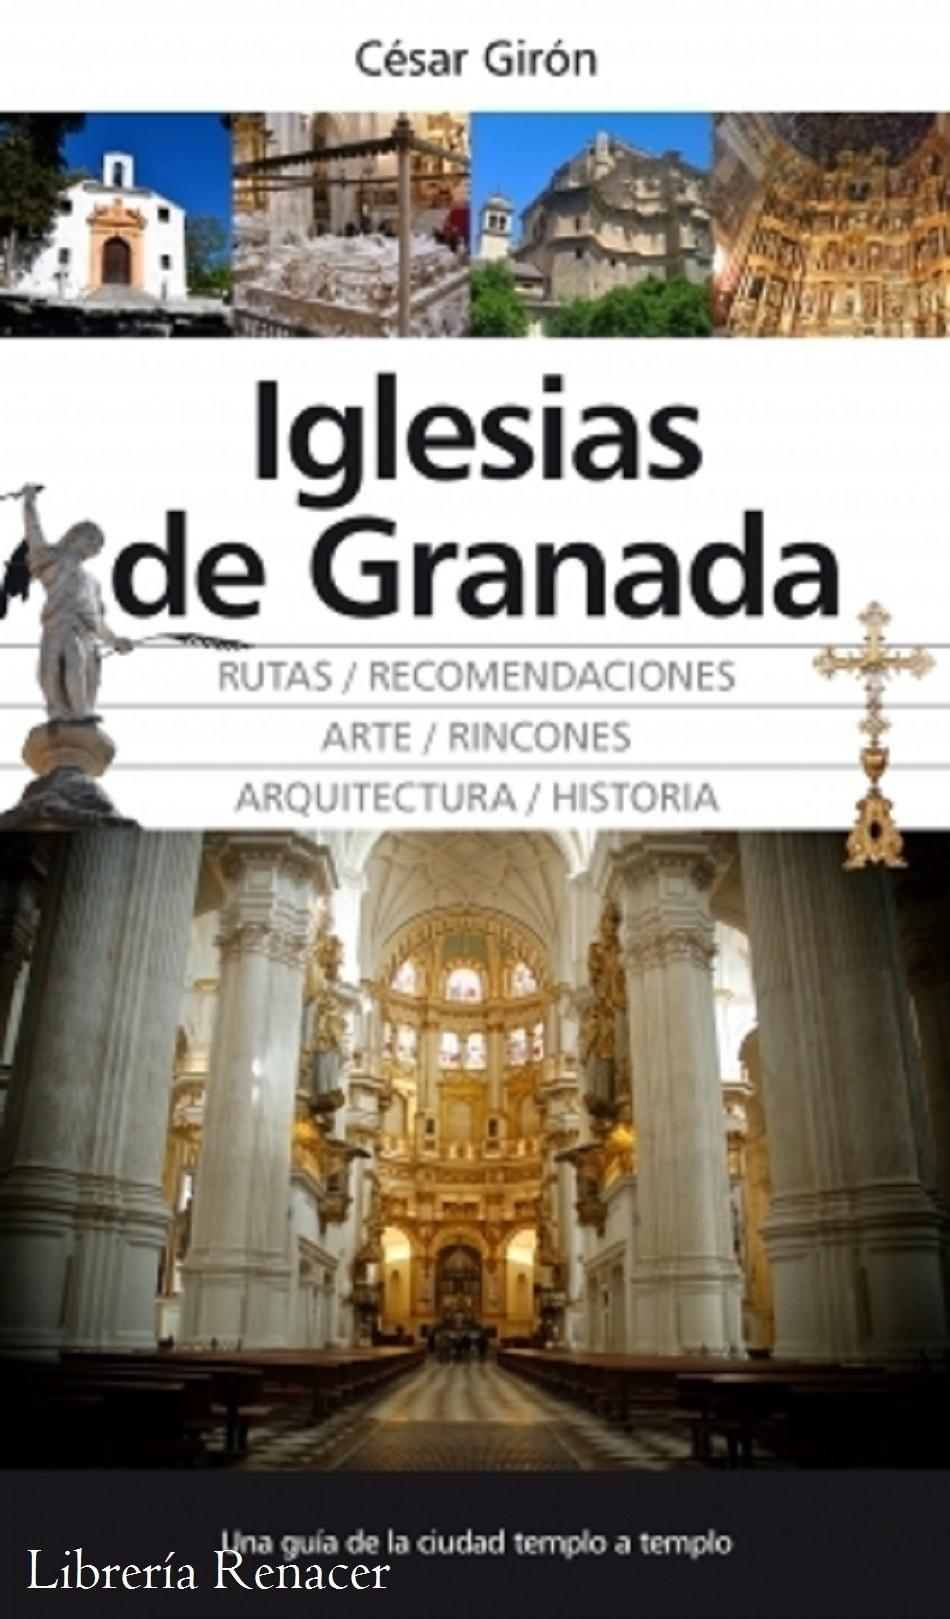 IGLESIAS DE GRANADA. RUTAS / RECOMENDACIONES / ARTE / RINCONES / ARQUITECTURA / HISTORIA